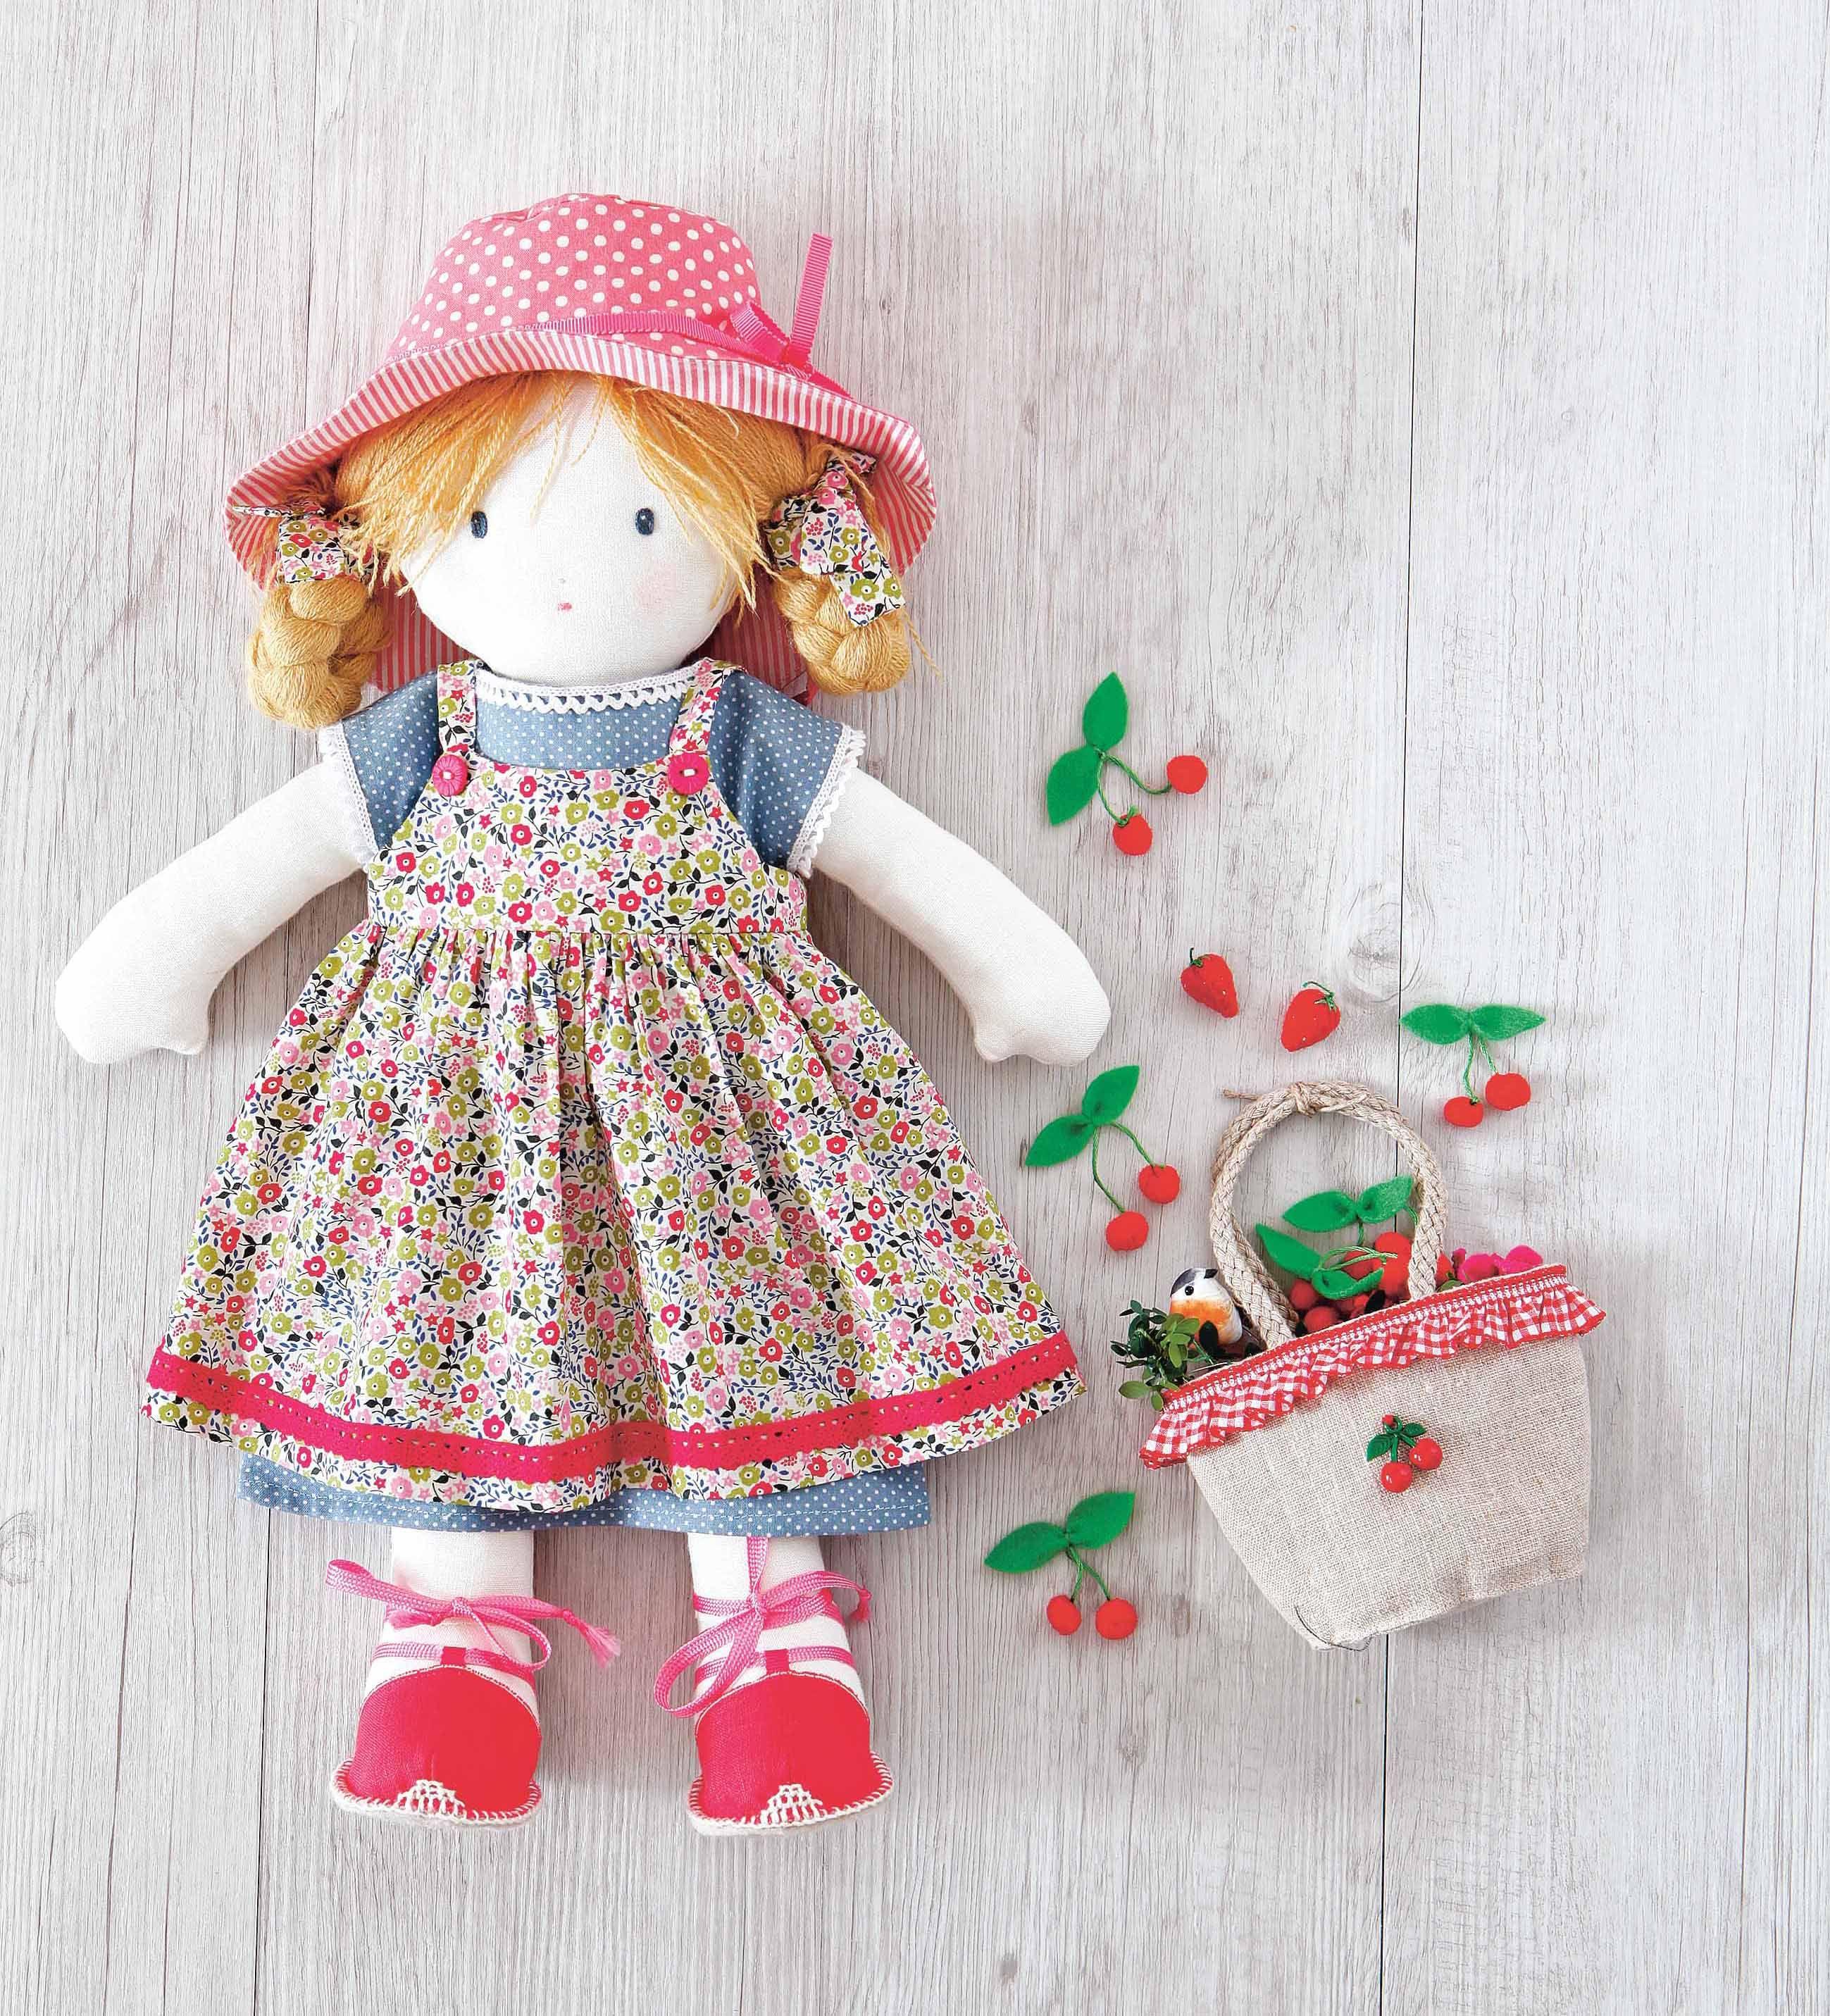 Pattern: Printable Rag Doll Sewing Pattern | Sewing | Pinterest - Free Printable Rag Doll Patterns